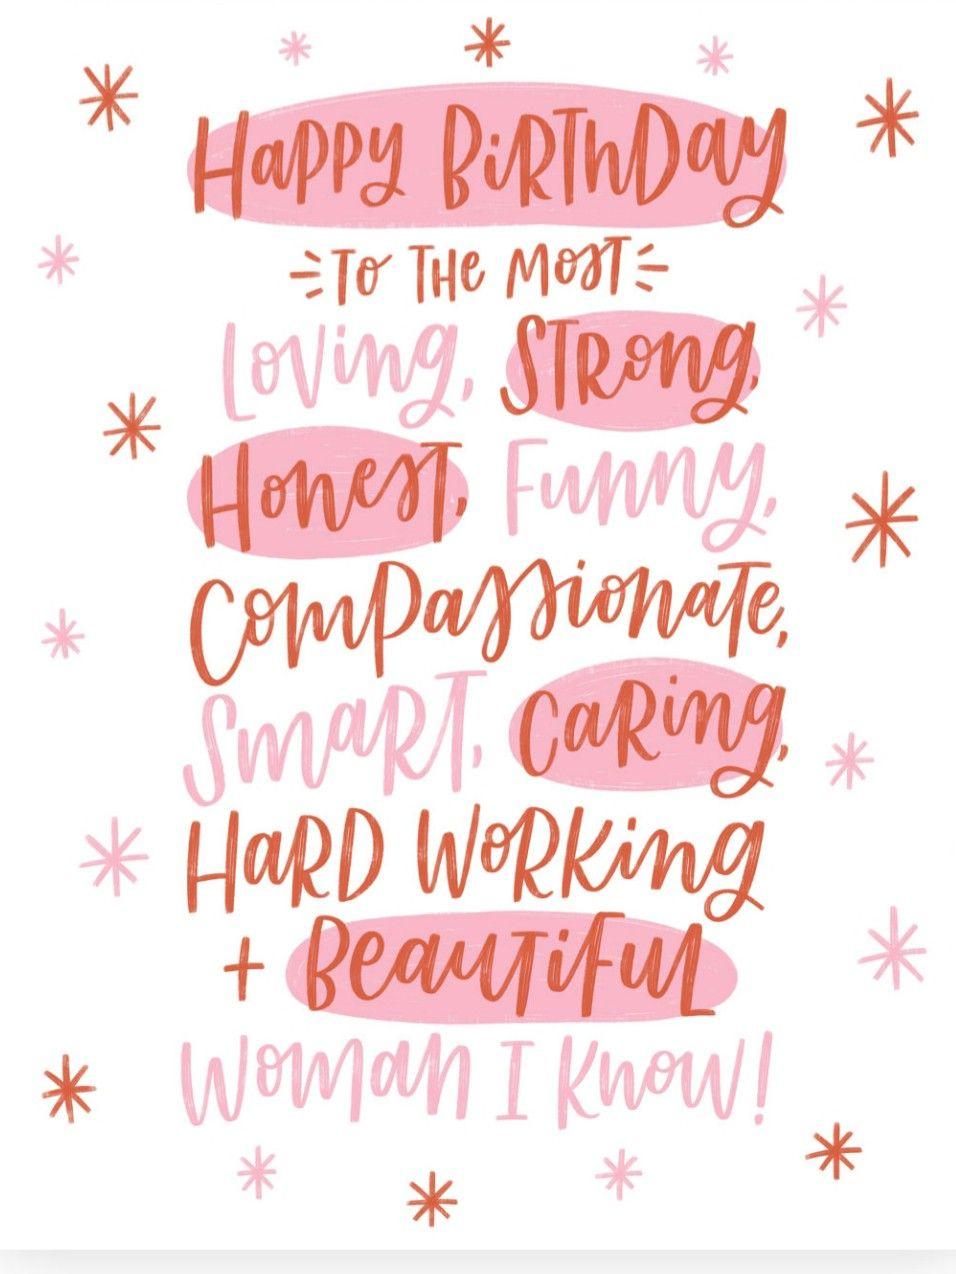 Wrinkles and Tinkles Sister Birthday Card Happy birthday